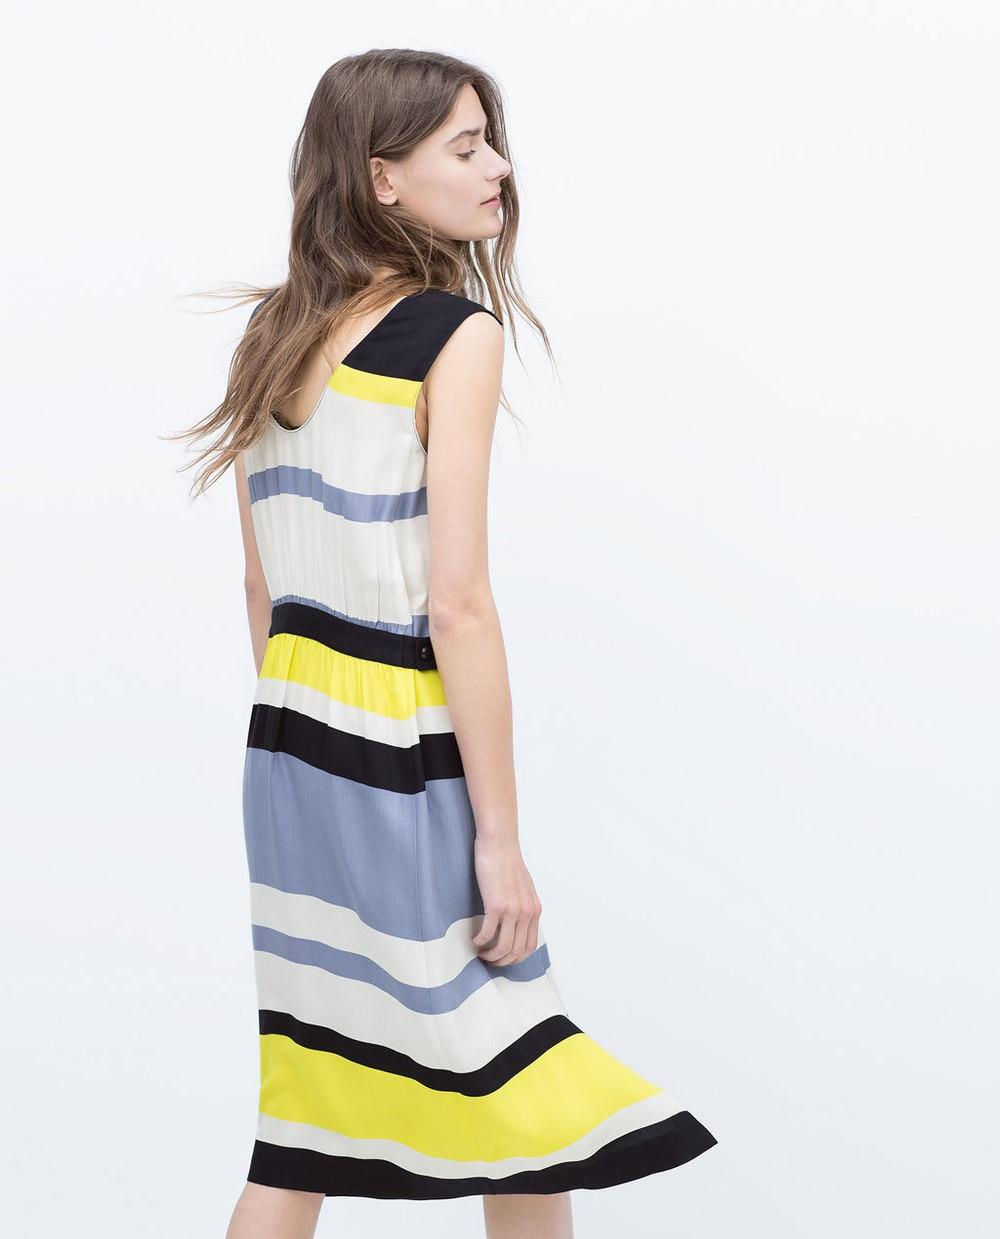 Robe jaune blanc bleu noir